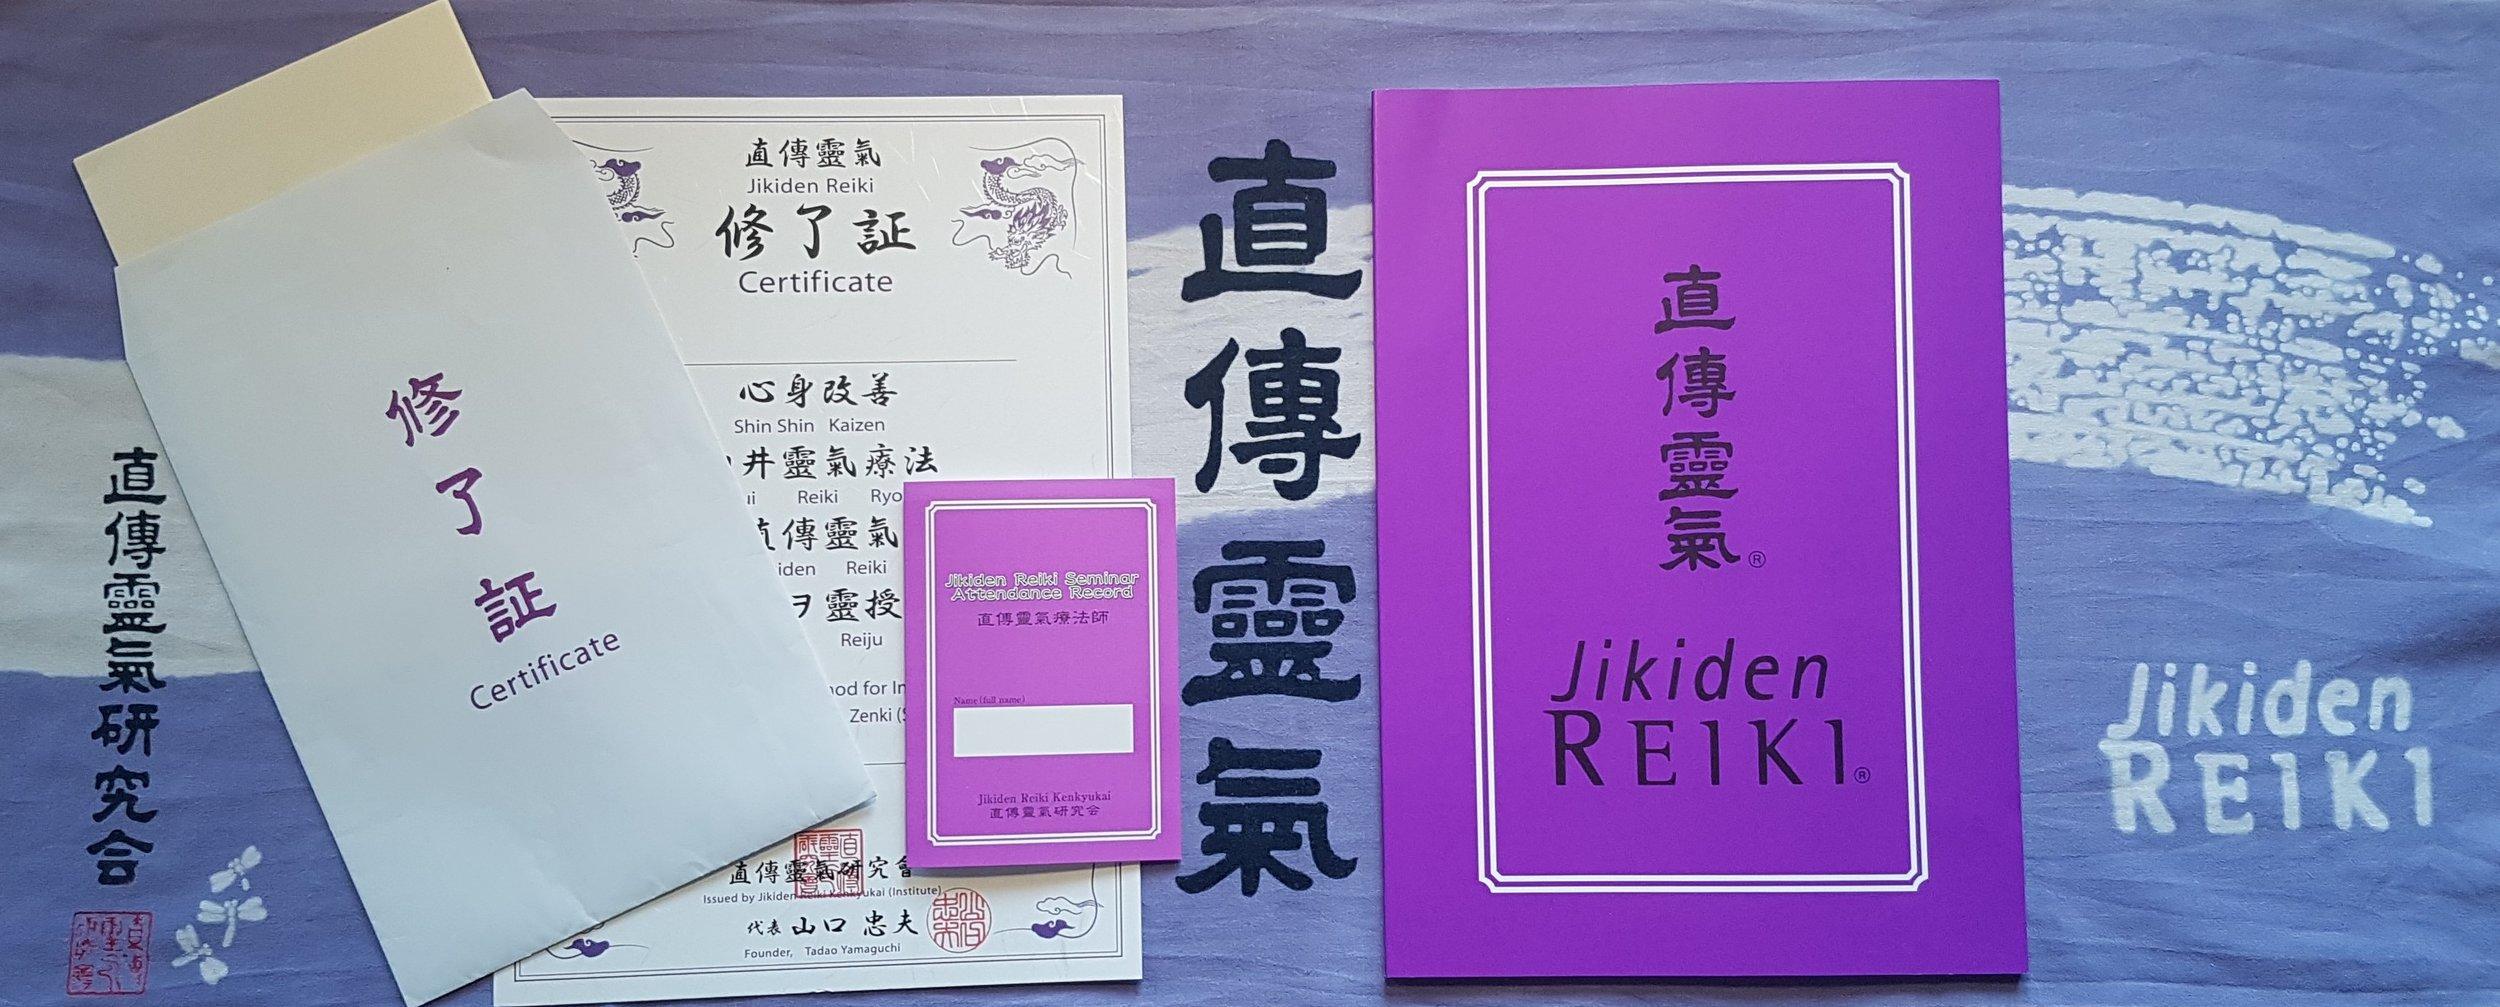 Jikiden Reiki course certificates